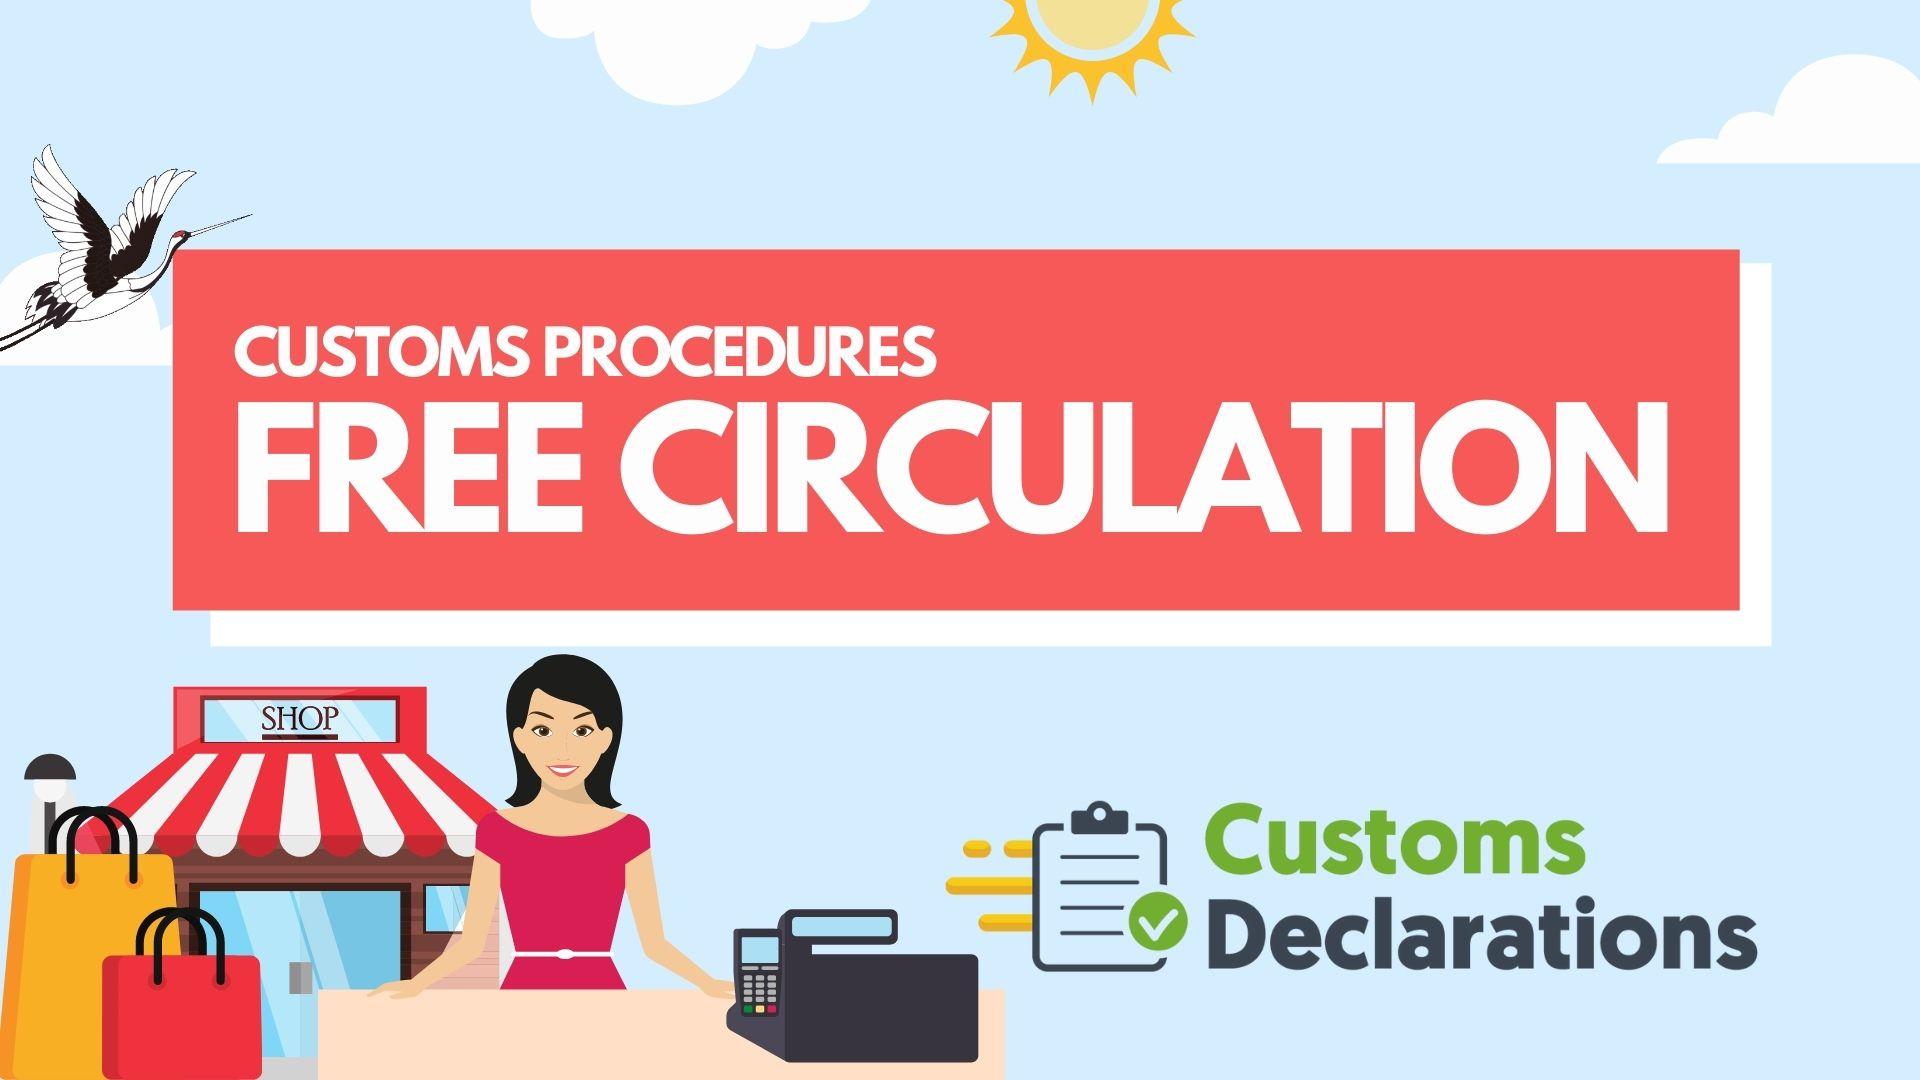 Free Circulation Customs Procedure